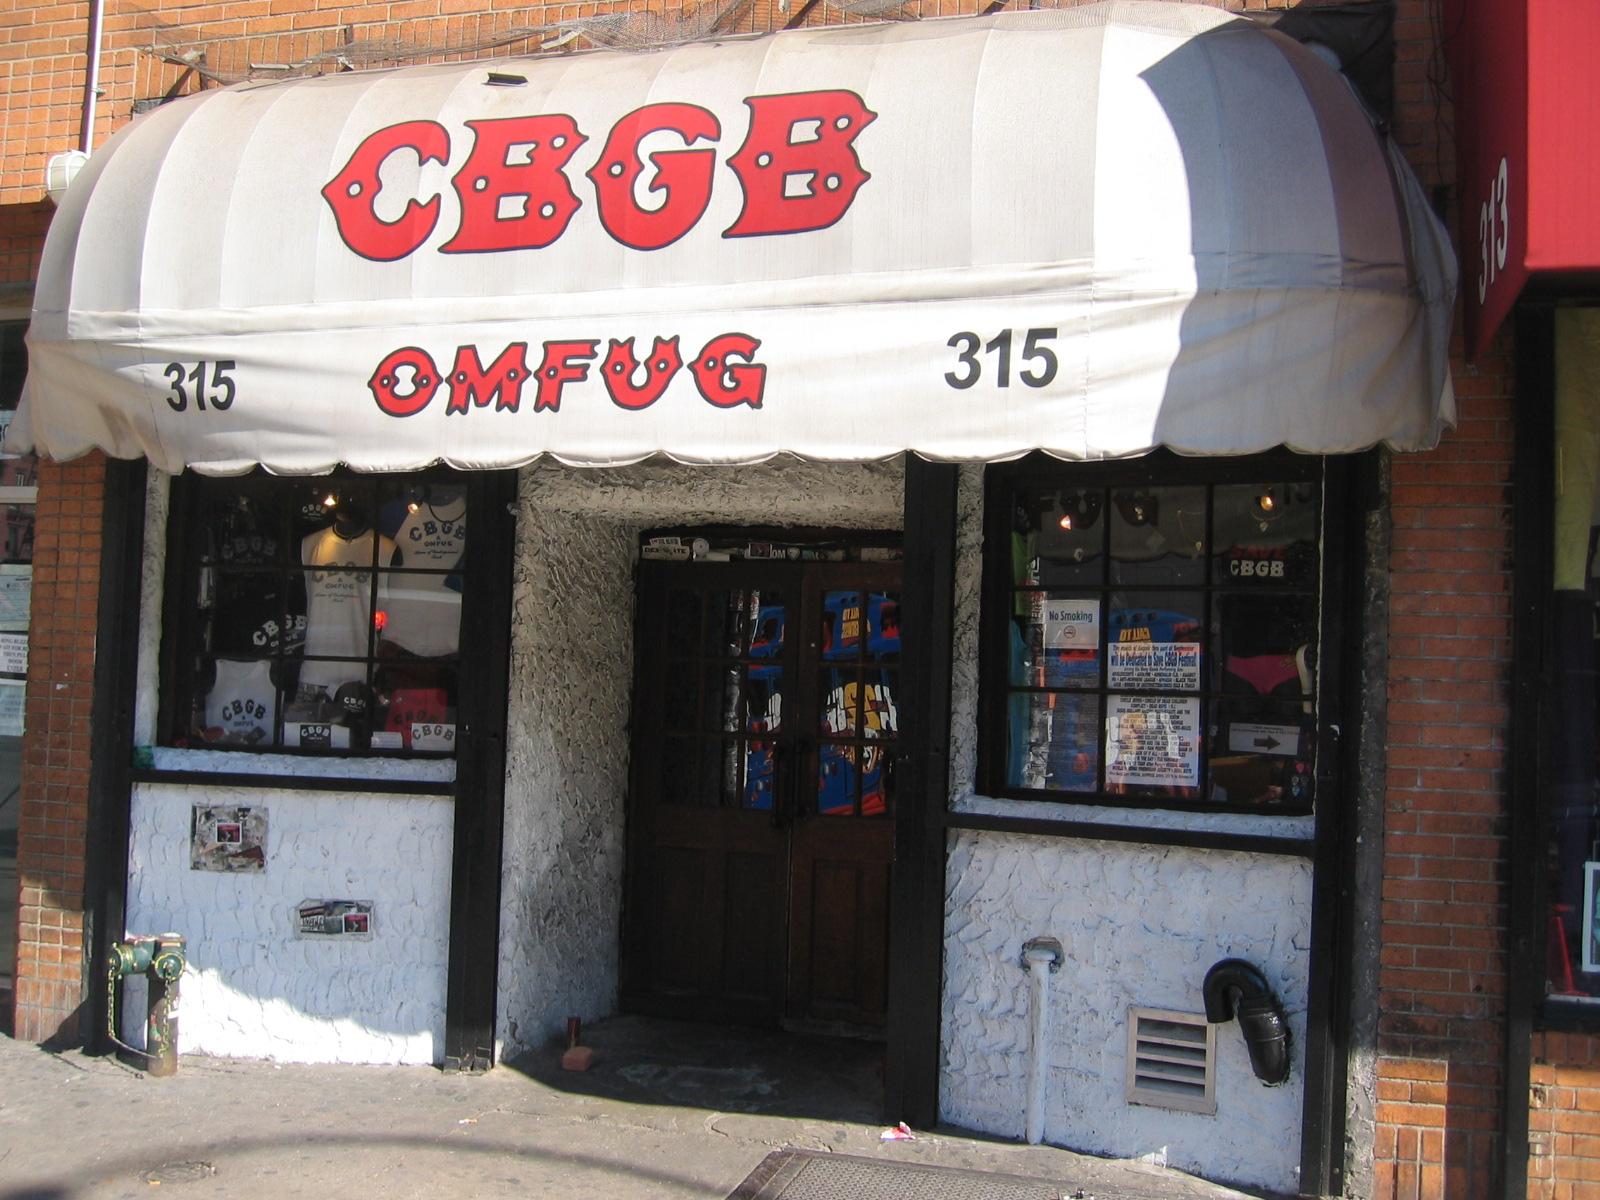 The legendary rock club CBGB. Photo by  adam dicarlo via wikimedia commons